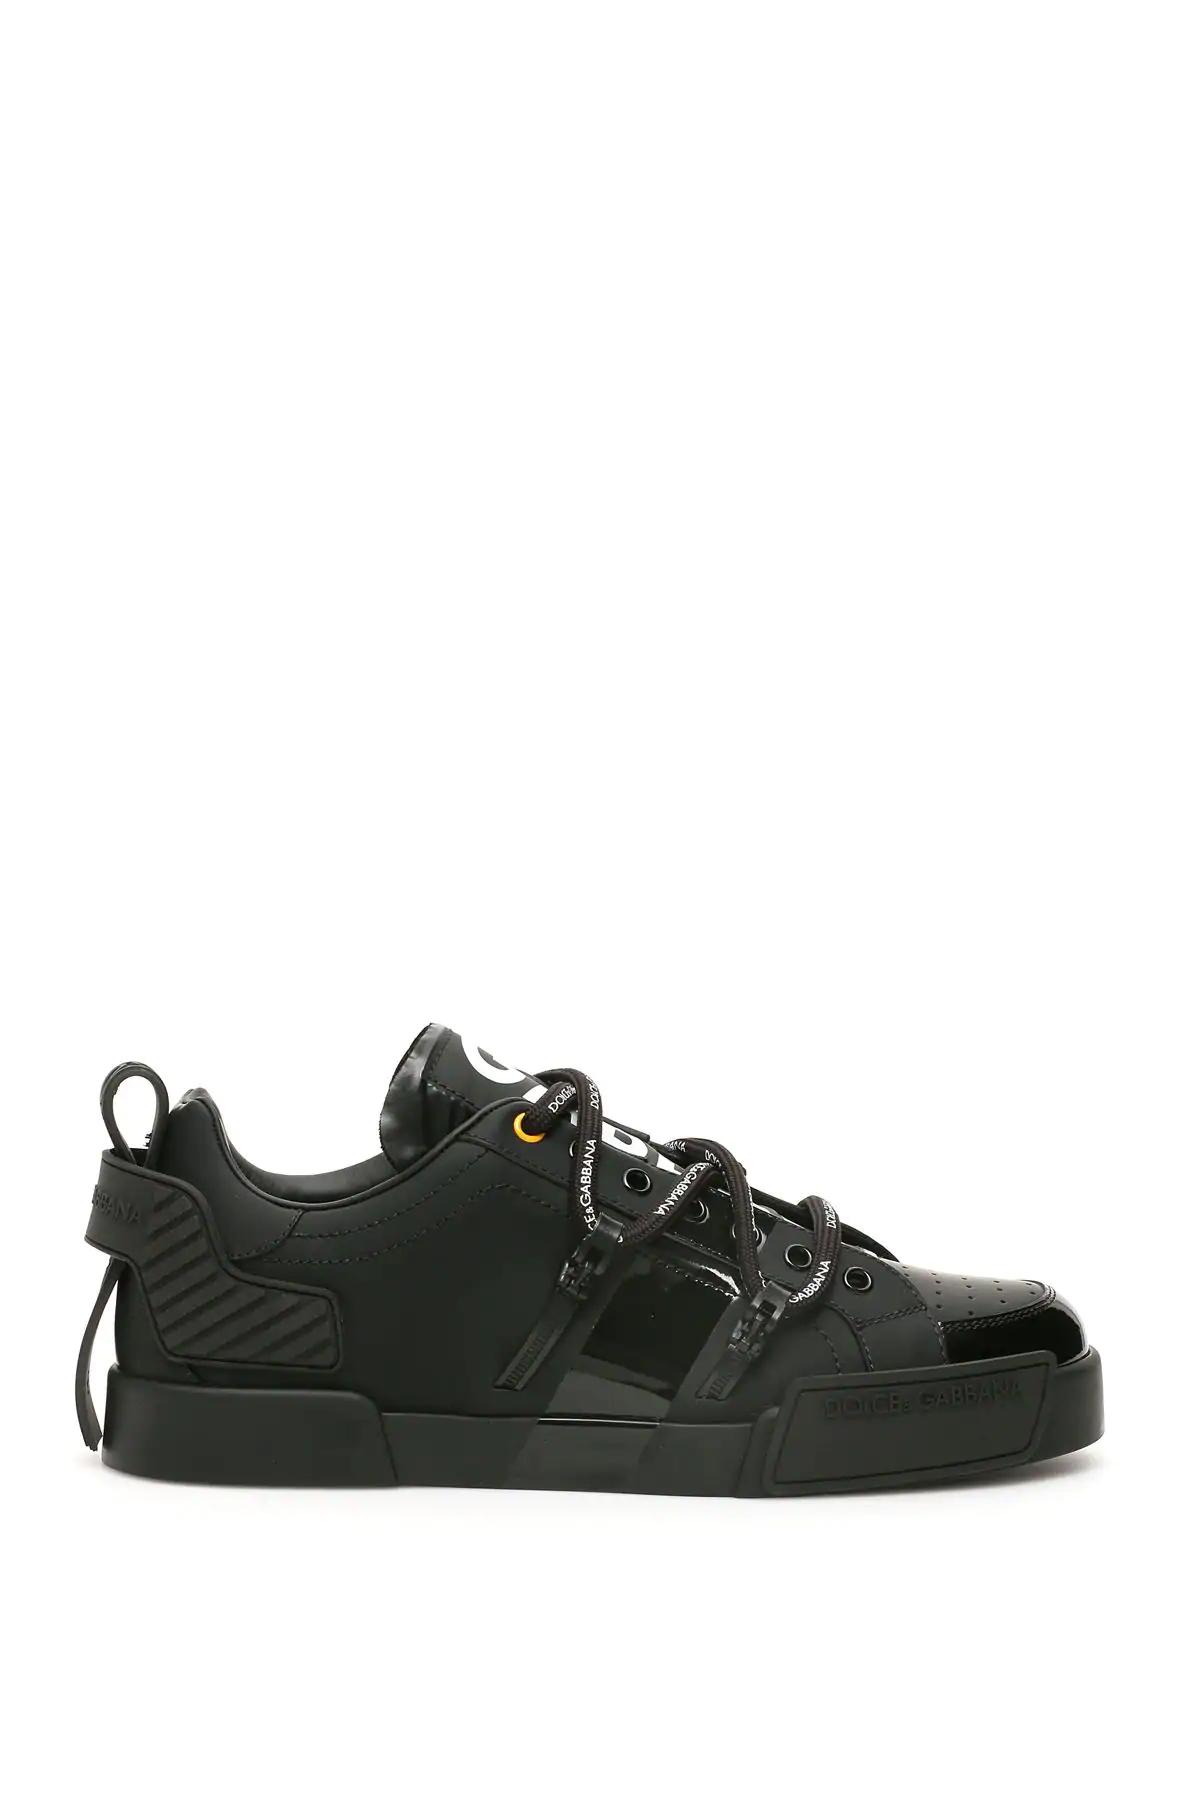 Dolce & Gabbana SS21 运动鞋